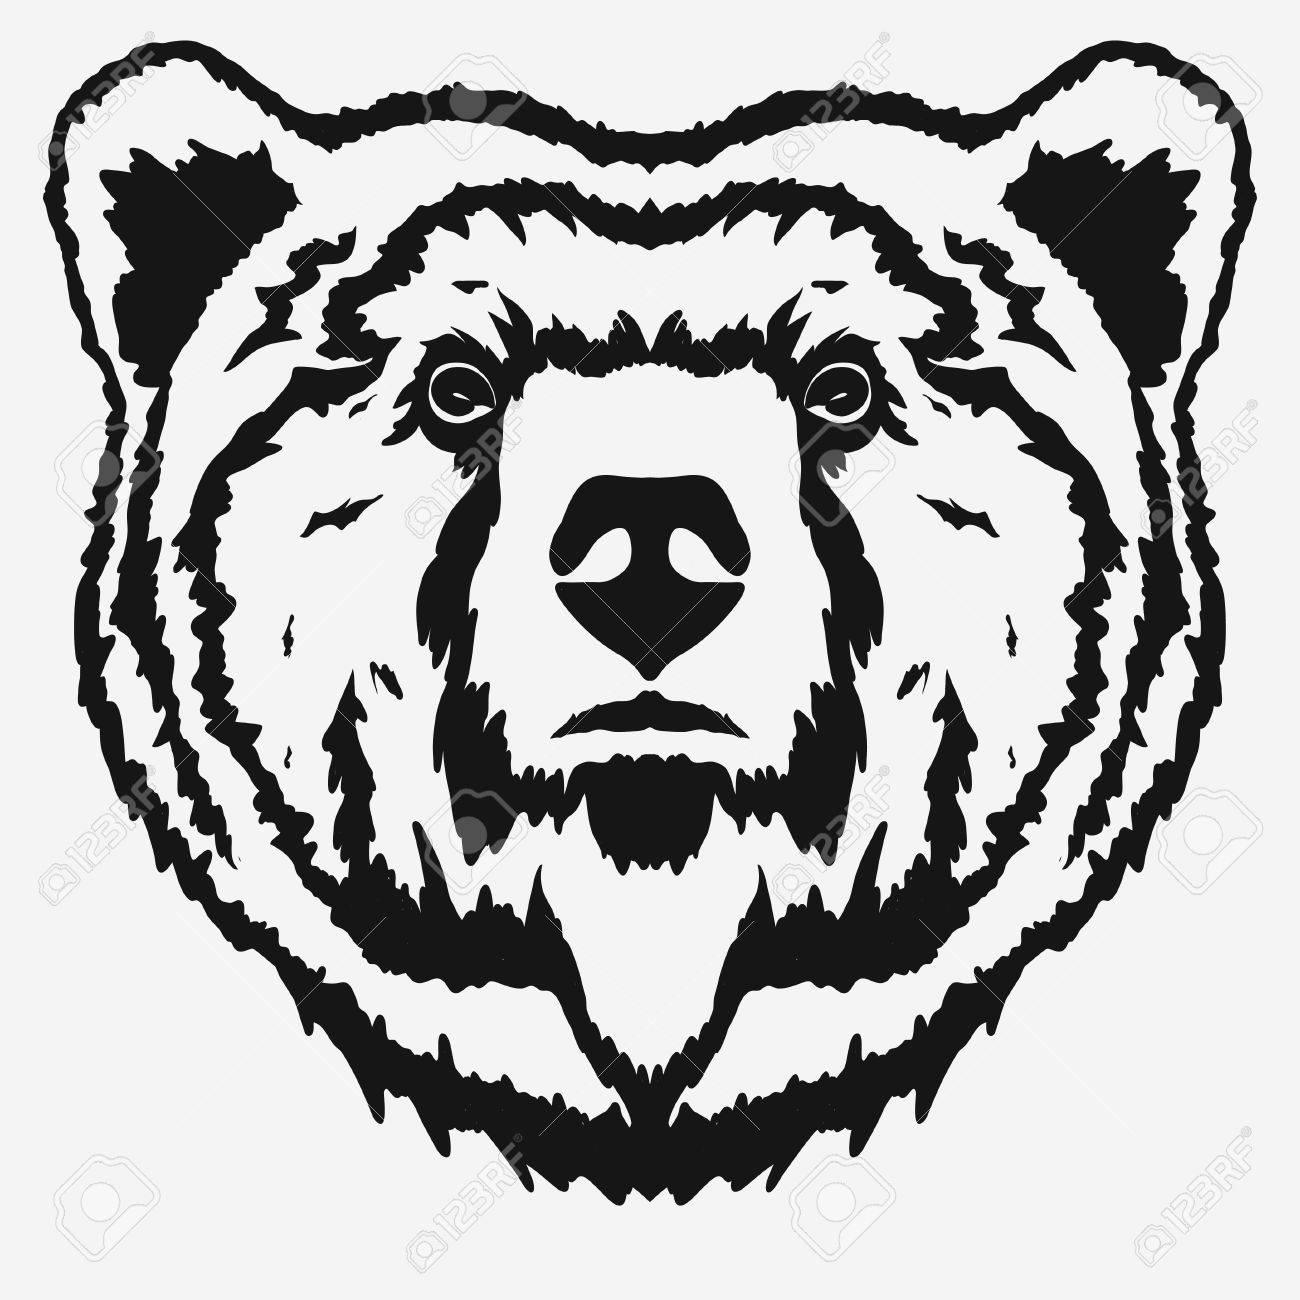 1300x1300 Bear Head Cartoon, Grizzly Mascot Hand Drawn Emblem, Wild Animal